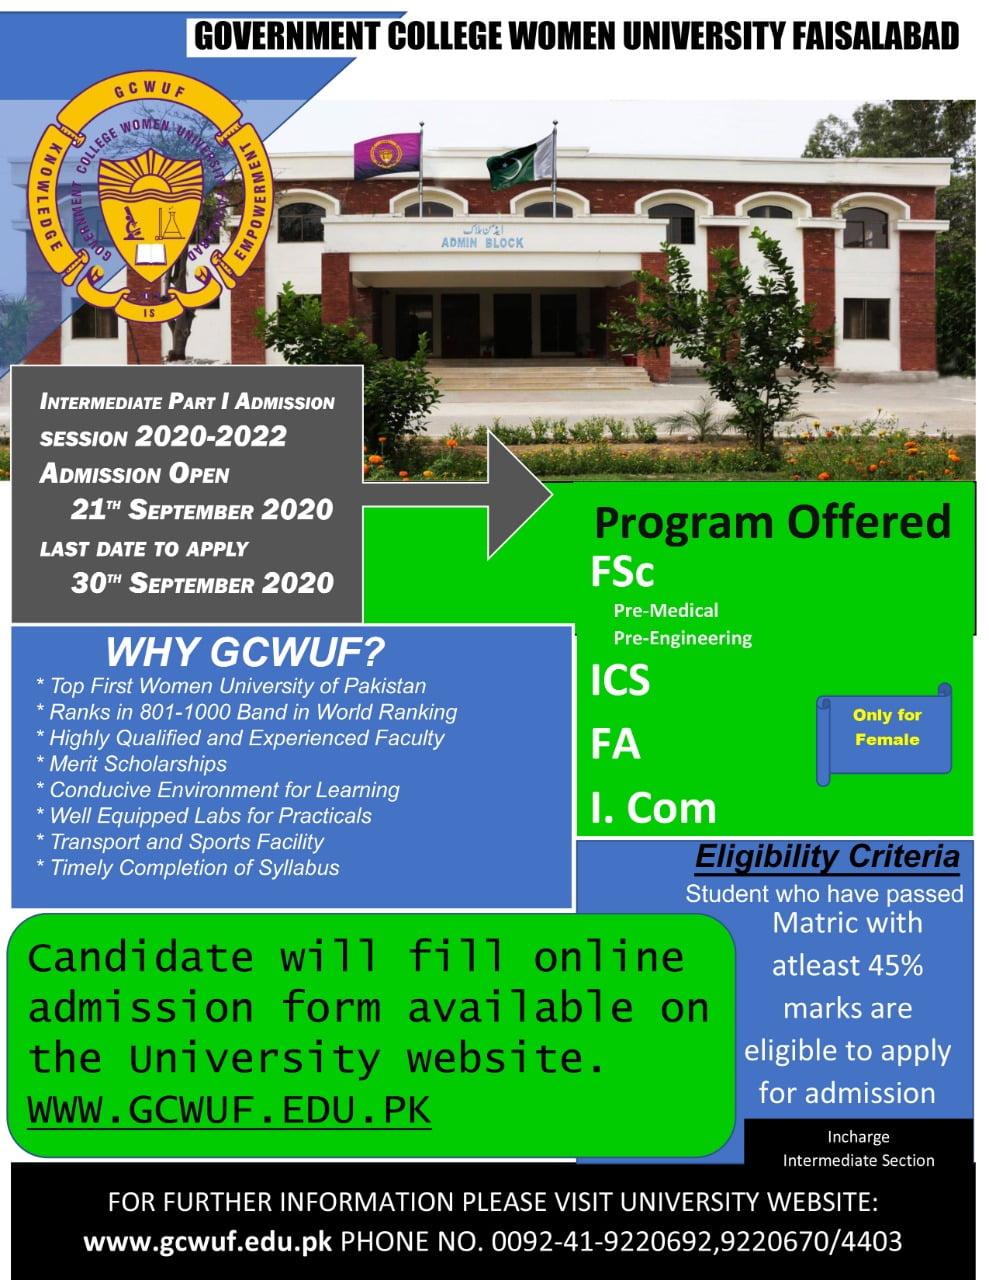 Government College Women University Faisalabad Inter Admission 2020-22